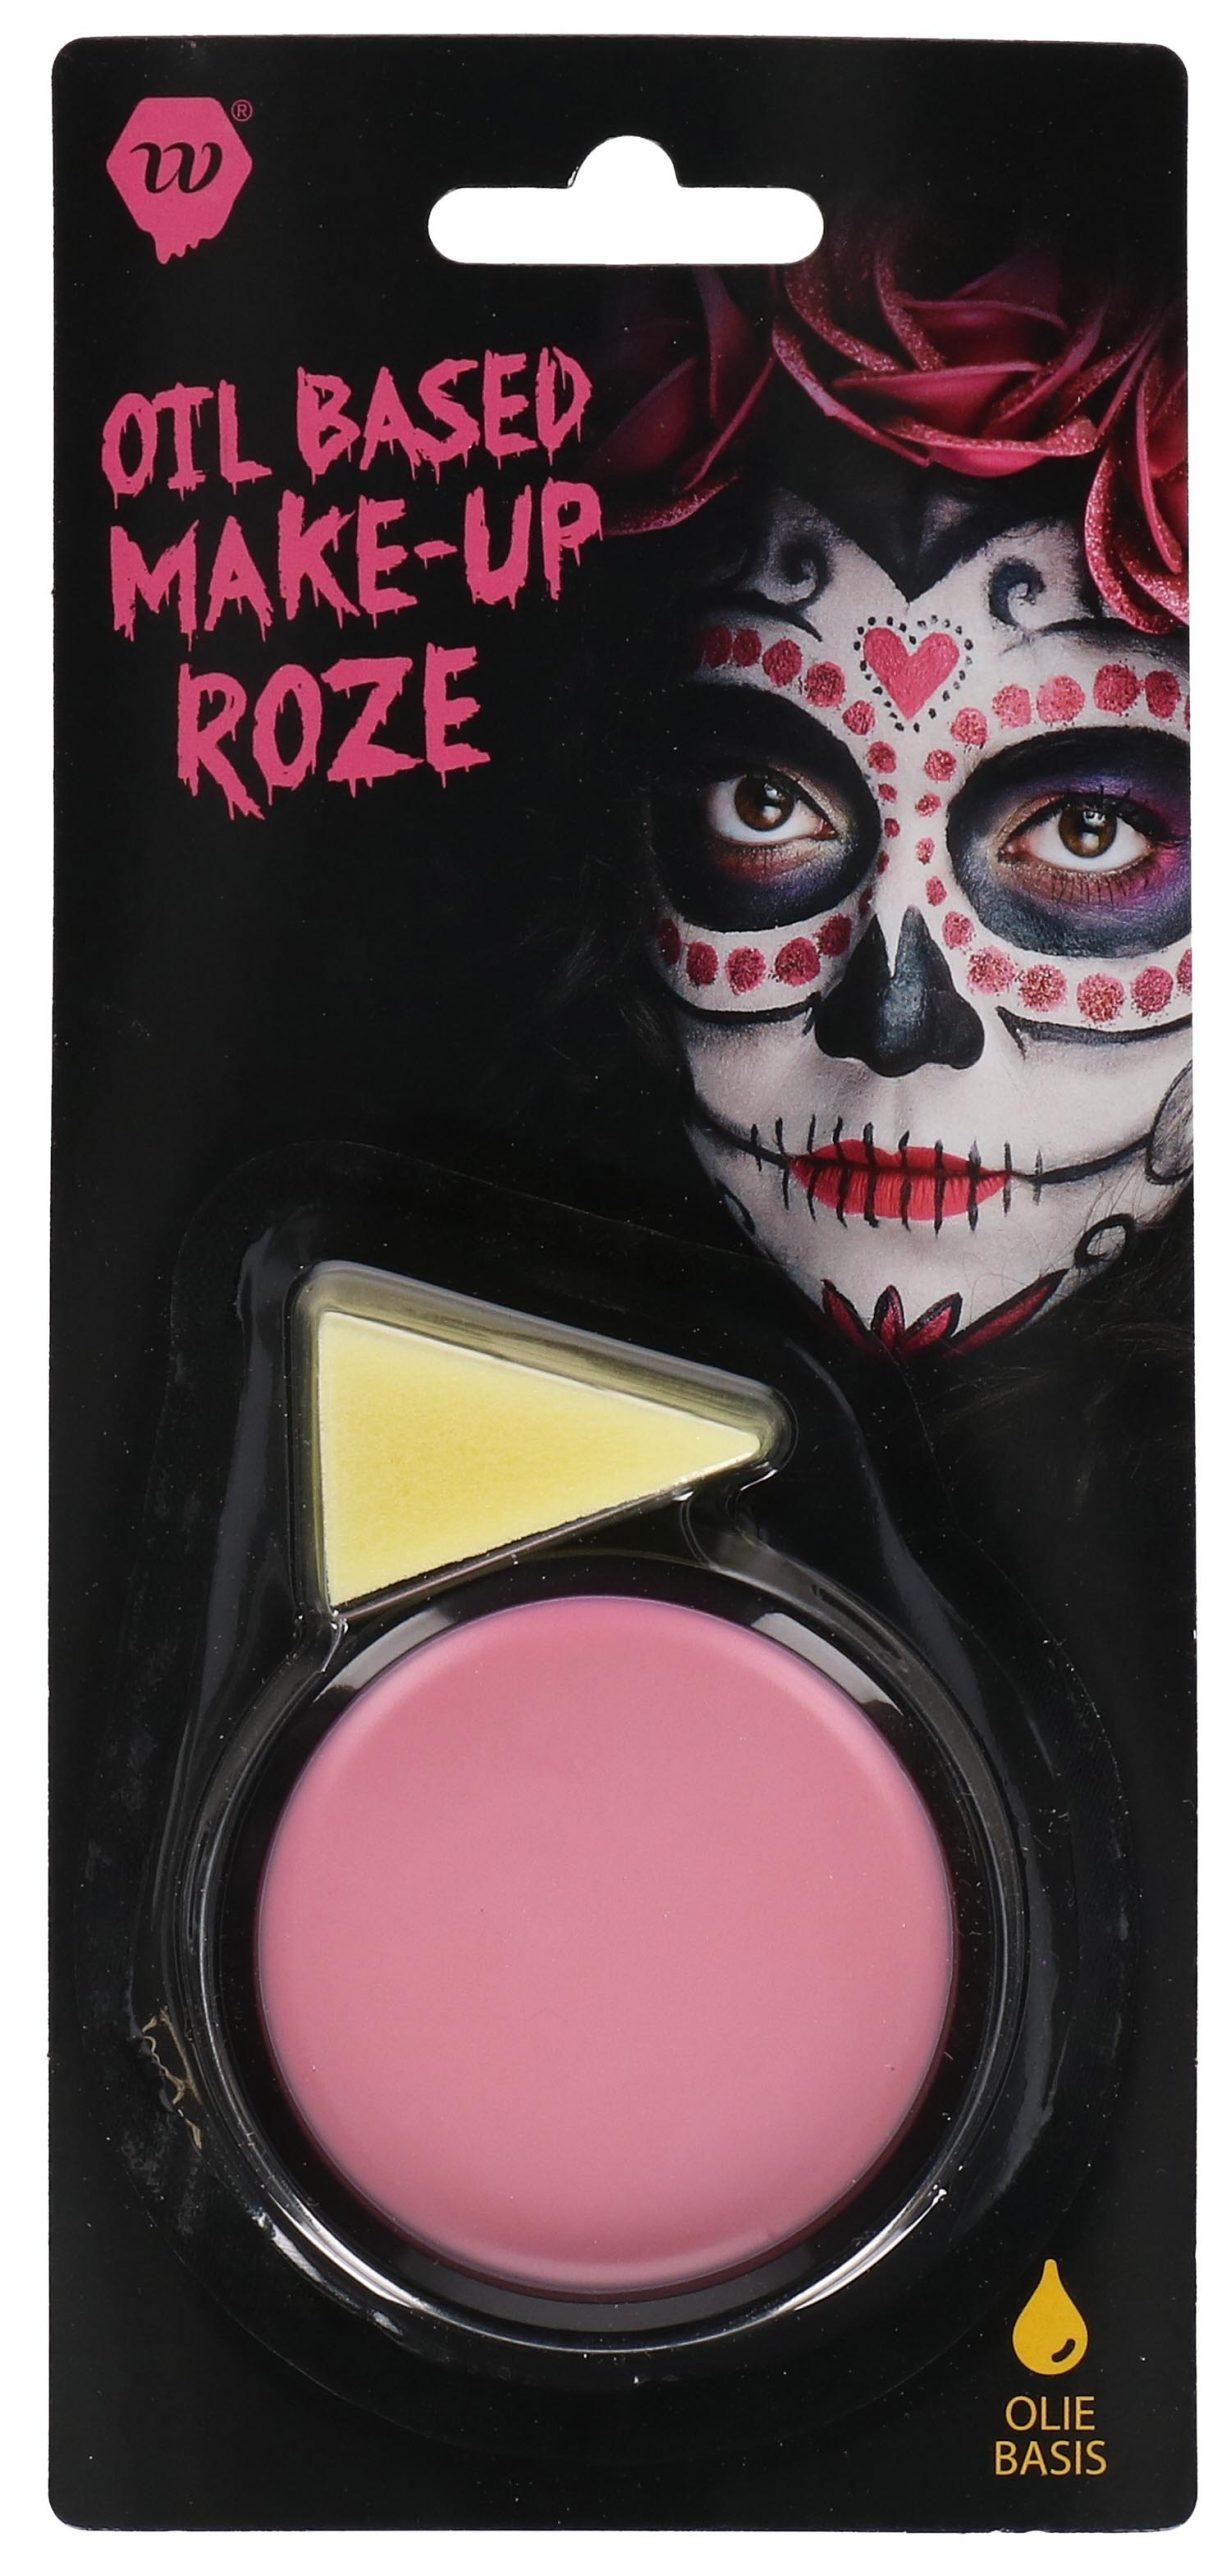 Oil-Based Make-up Roze Wauwfactor